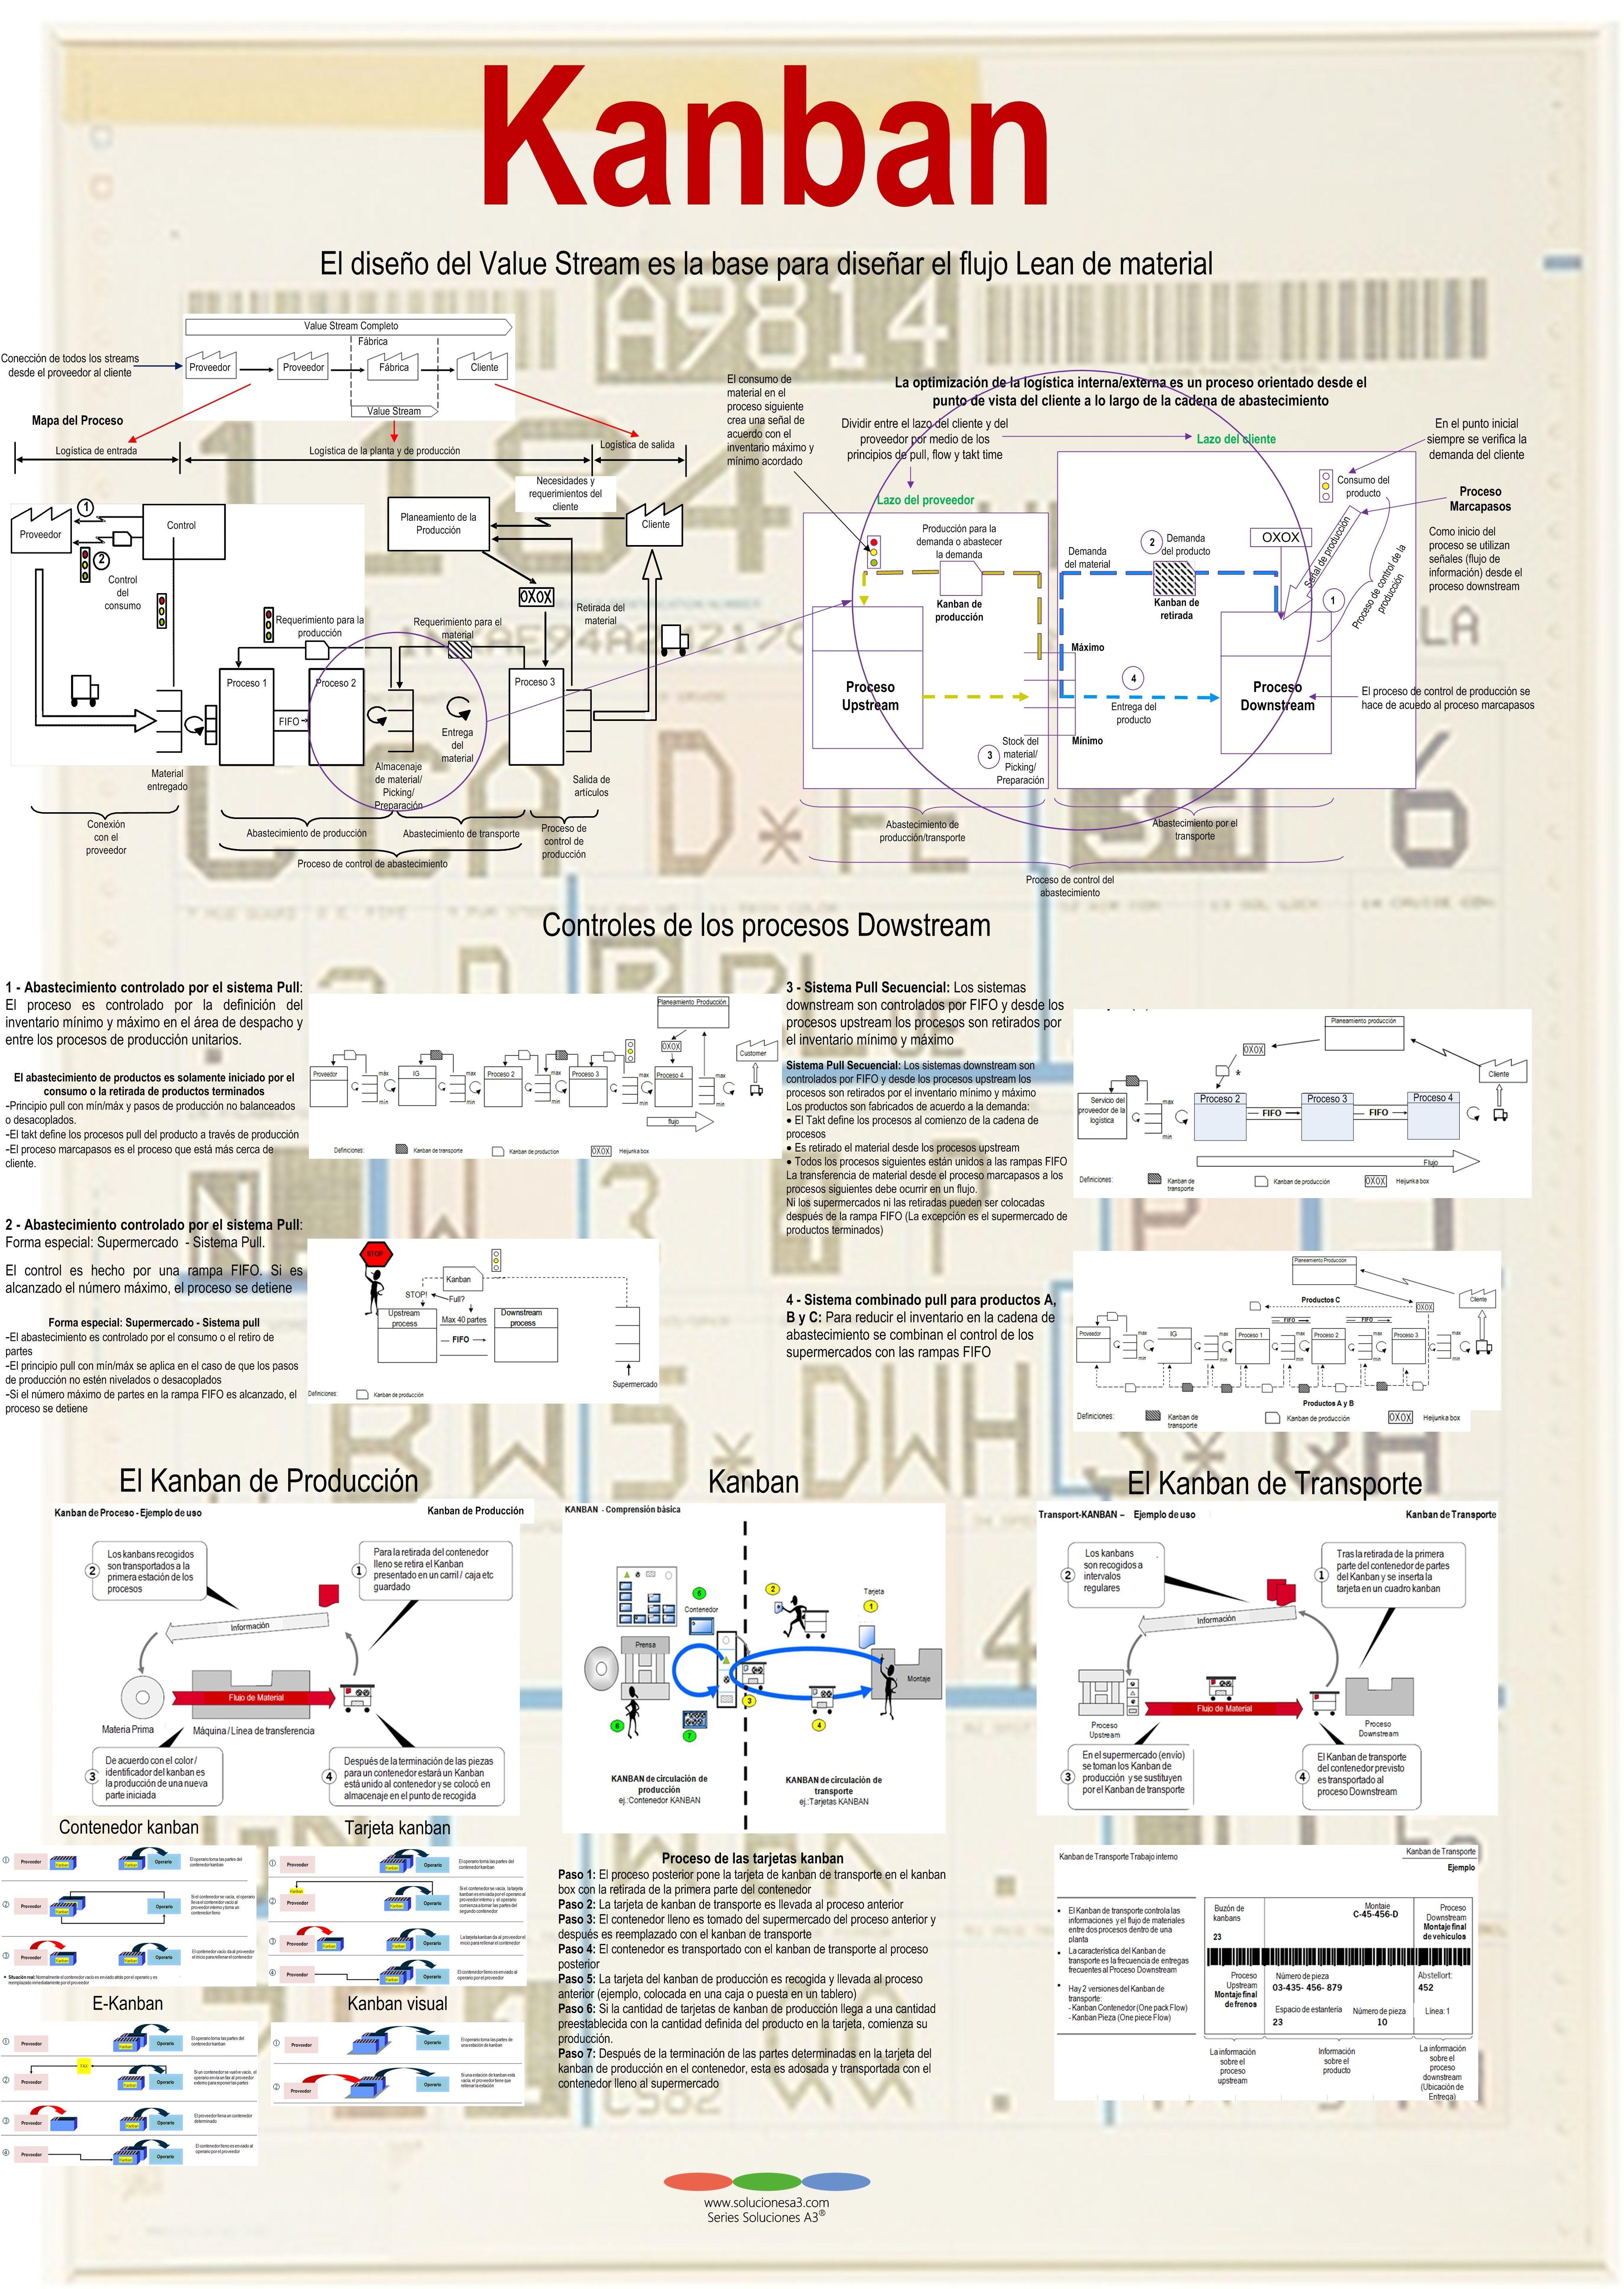 CFC_A3_example.jpg 800×501 pixels | PDCA | Pinterest | Project ...